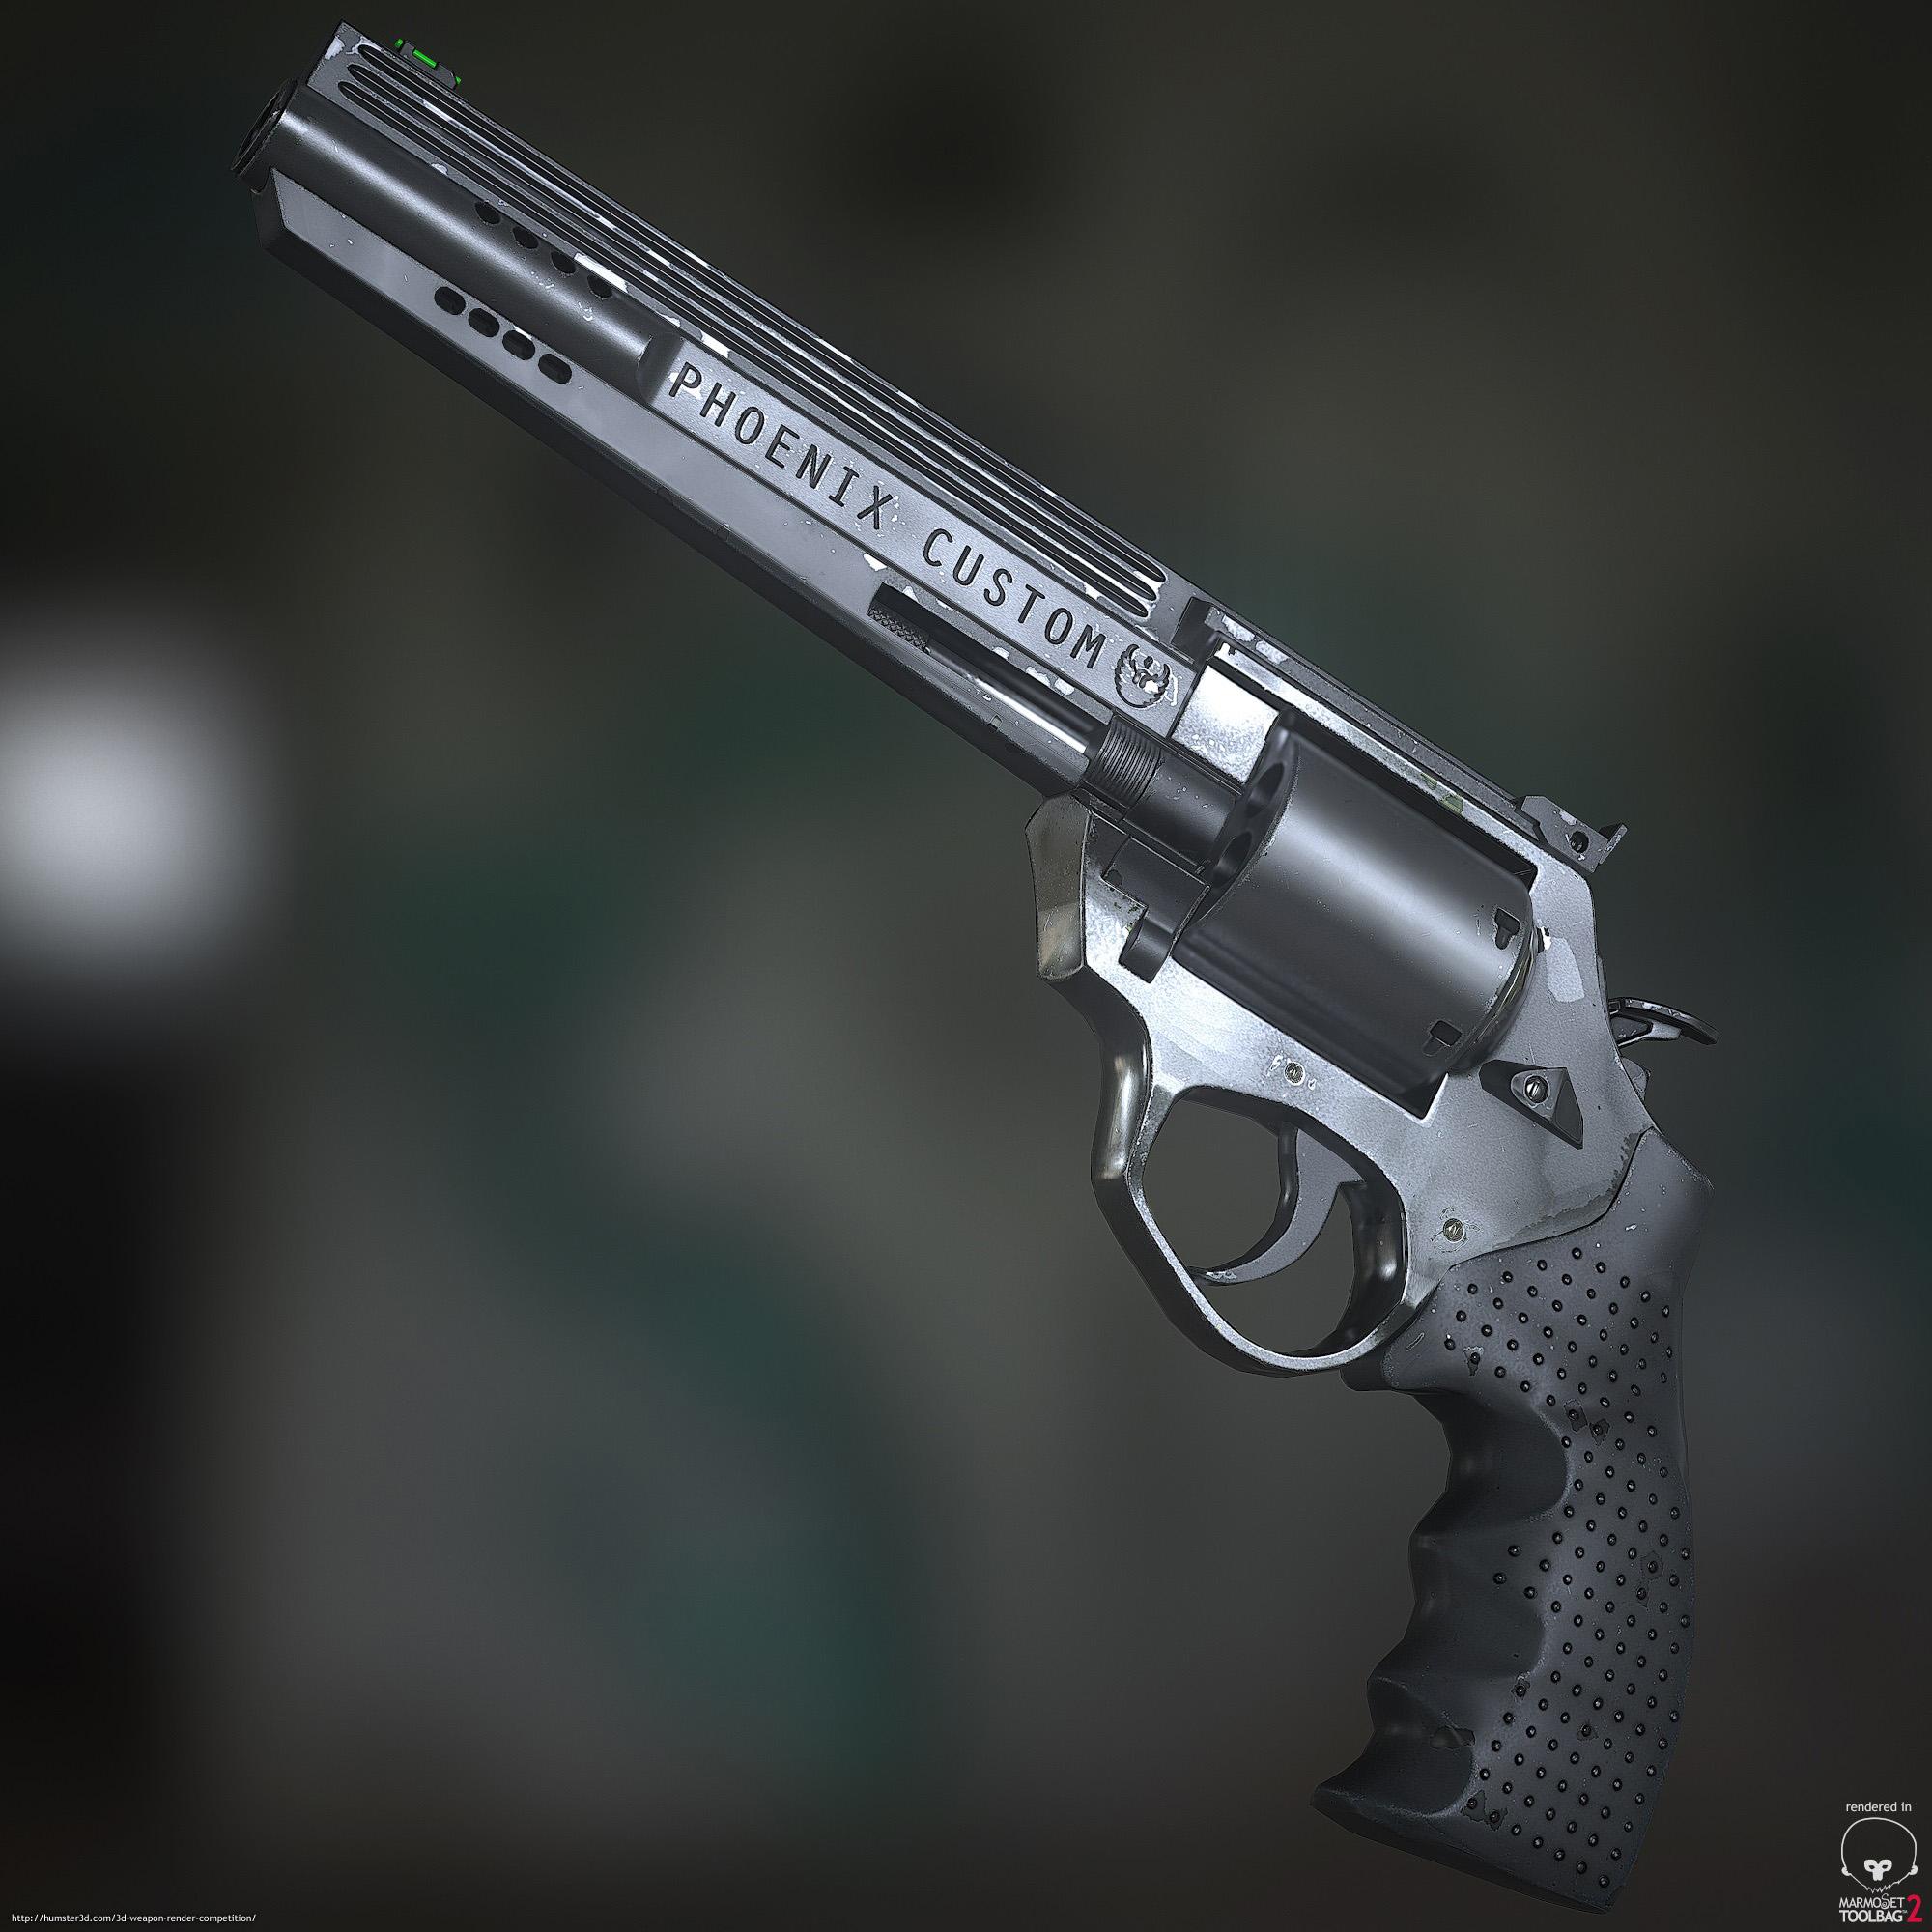 Phoenix Custom Revolver 3d art